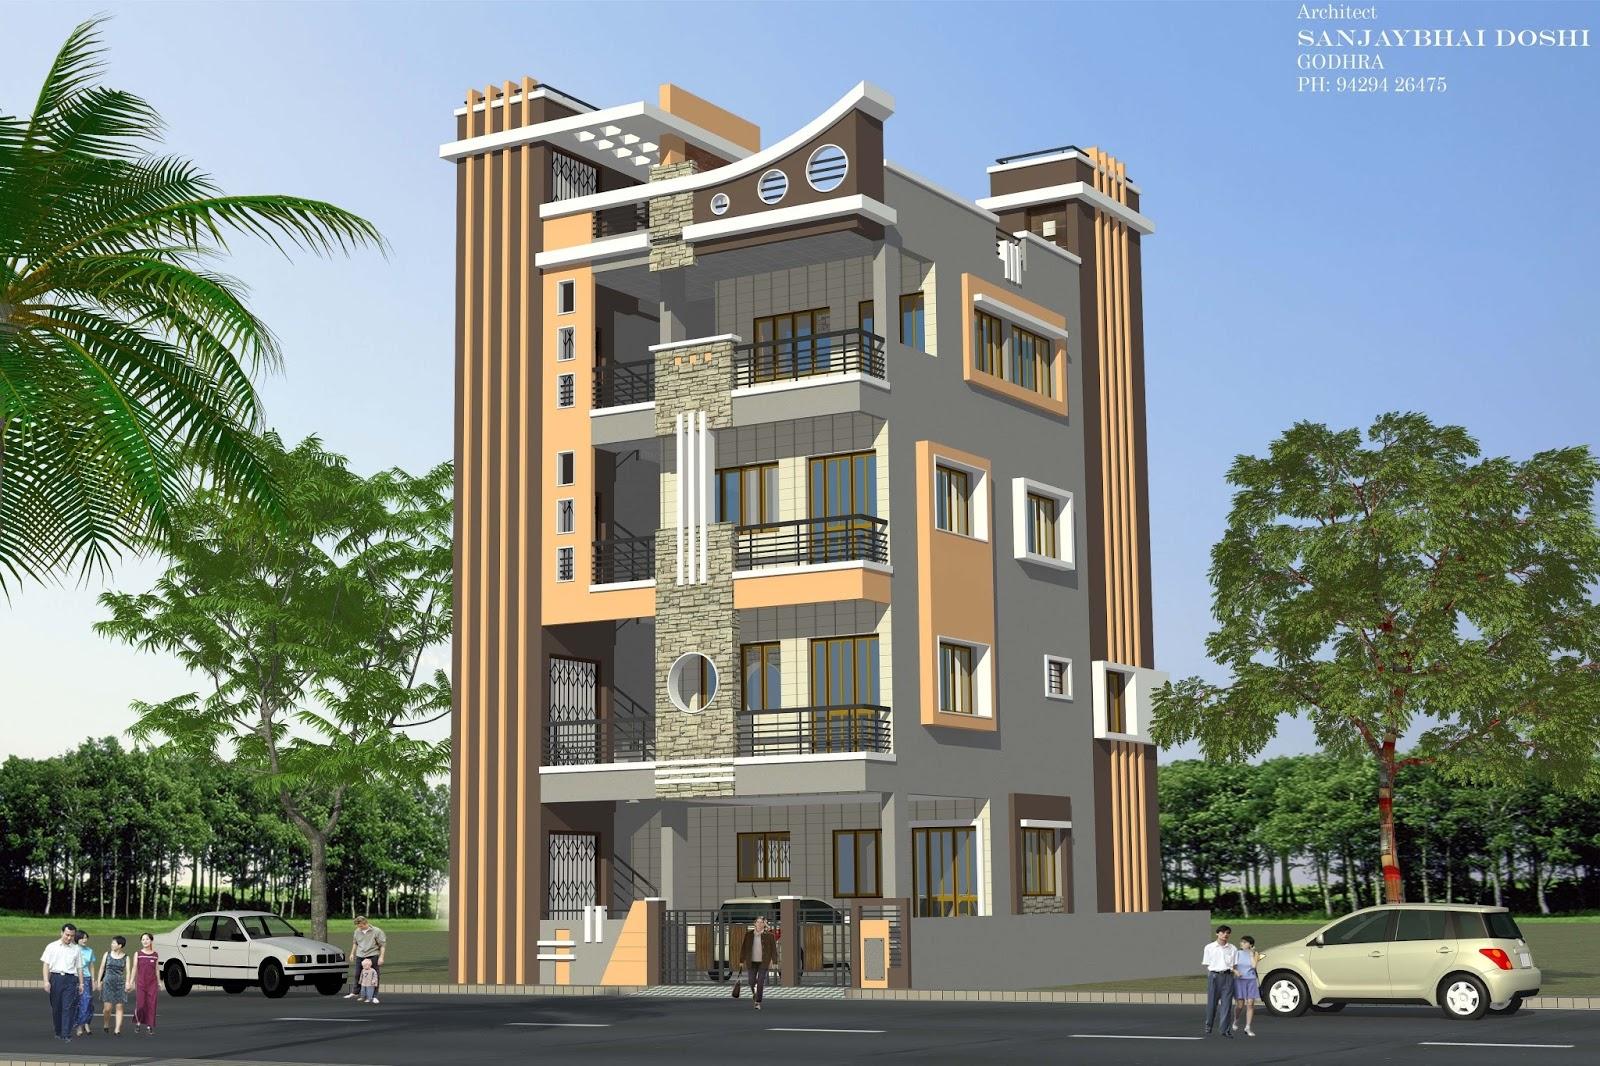 Modern 2 storey apartment design exterior desain rumah - 3 storey building exterior design ...